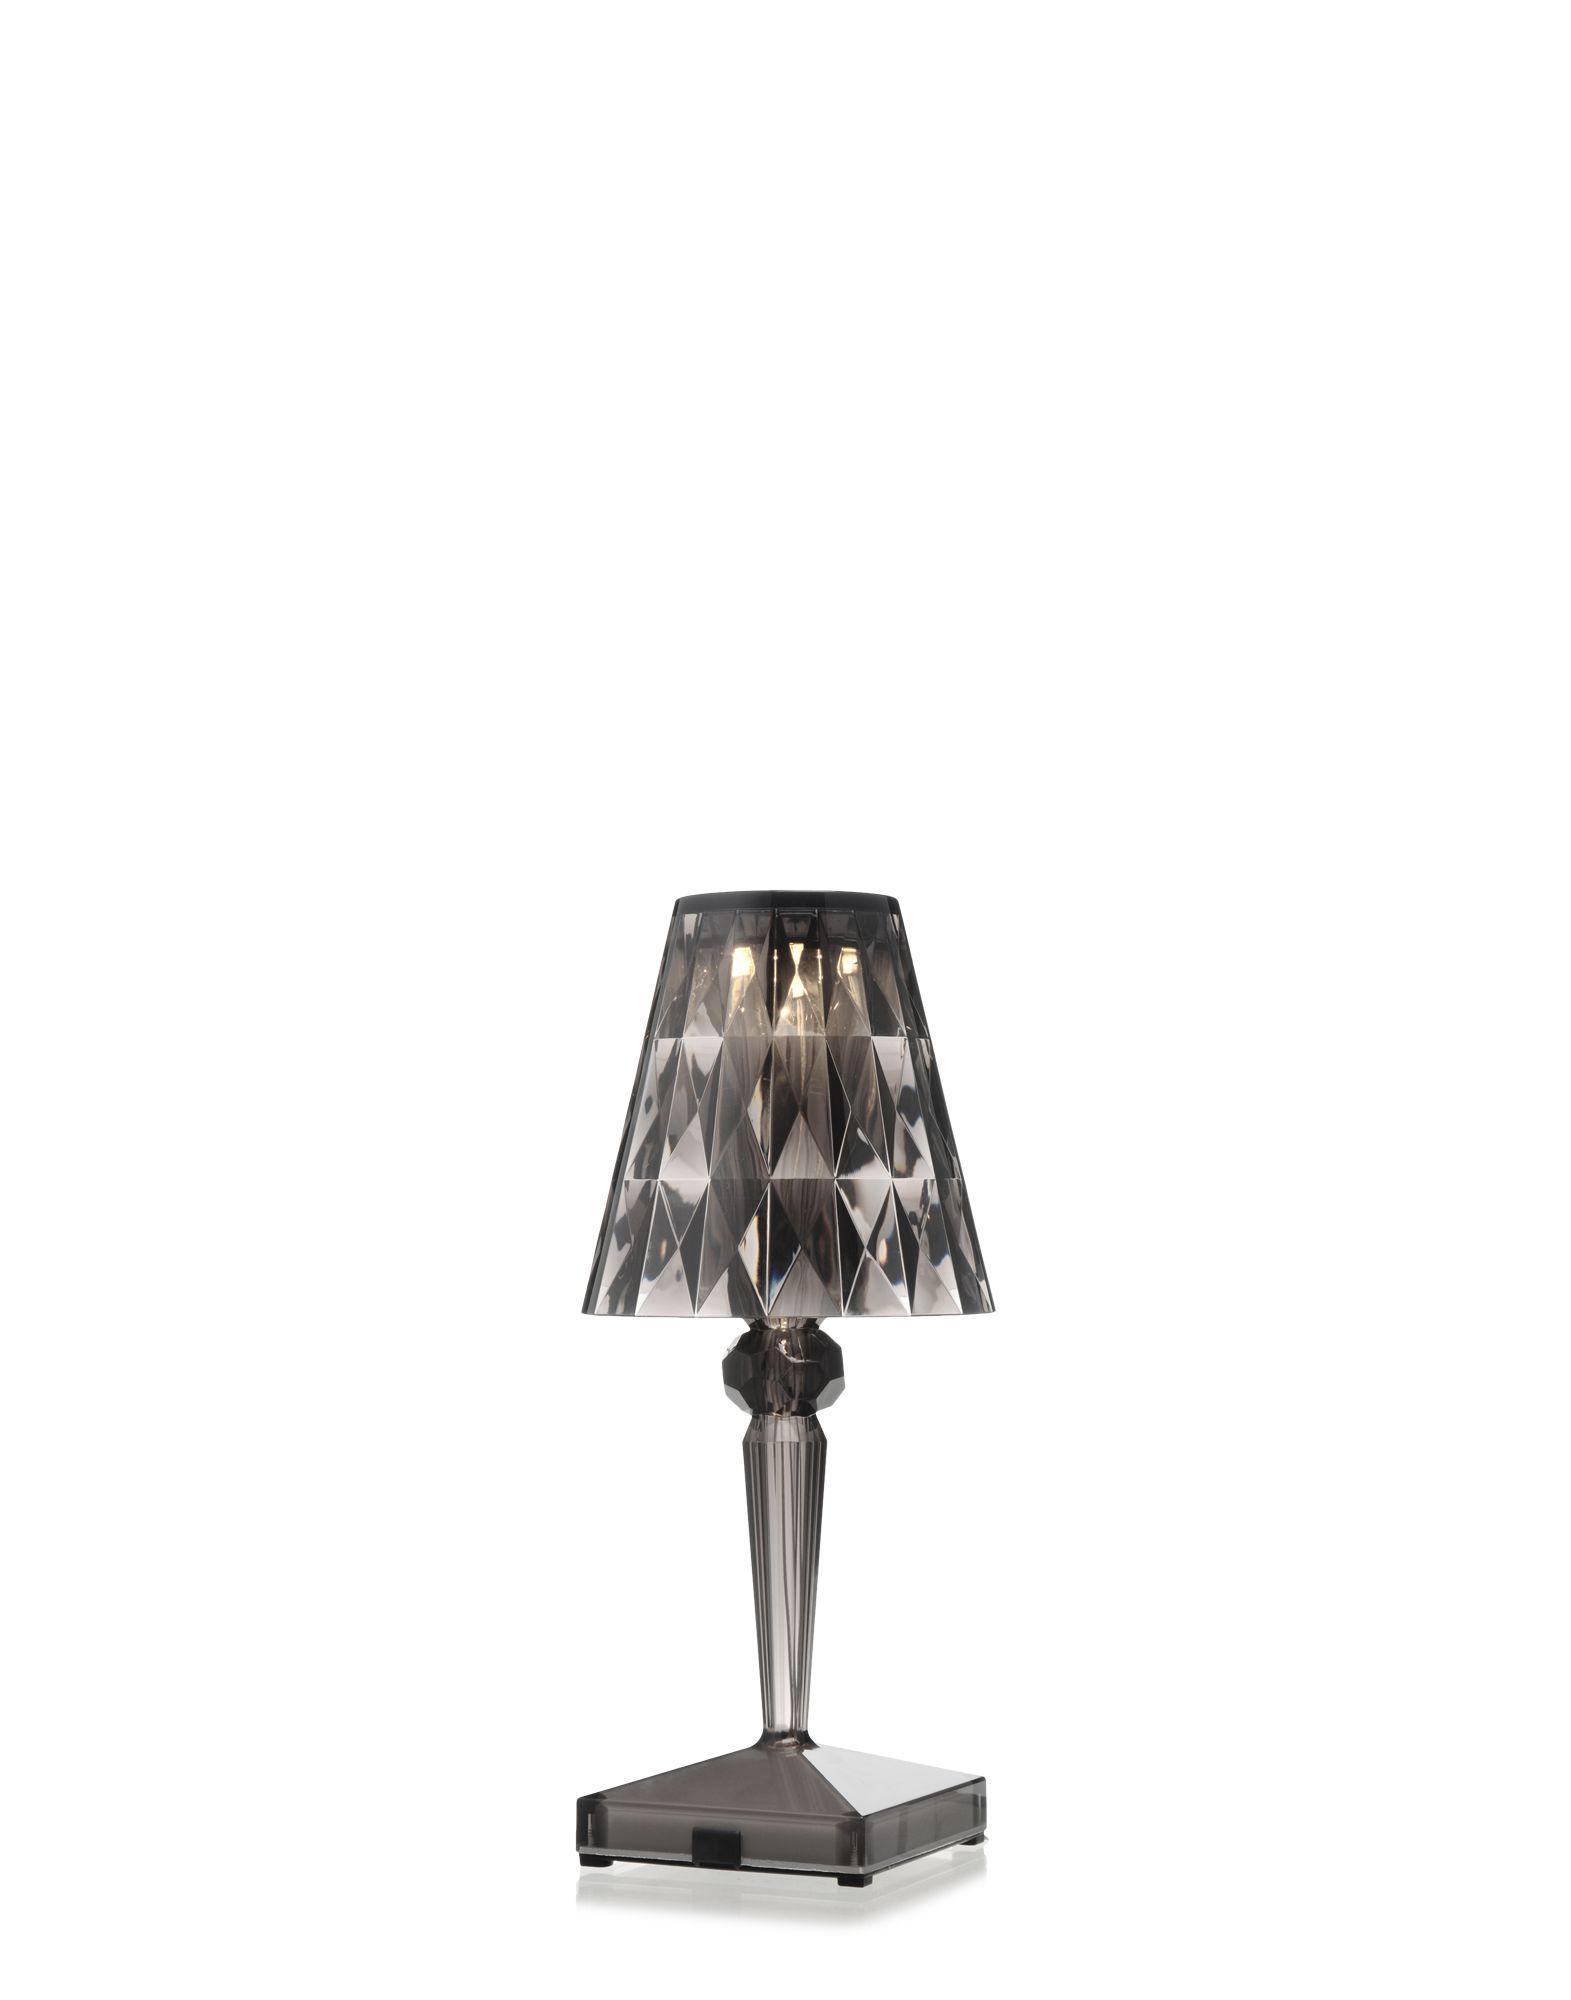 Kartell lampada da tavolo 9140 Battery fume, Newformsdesign ...